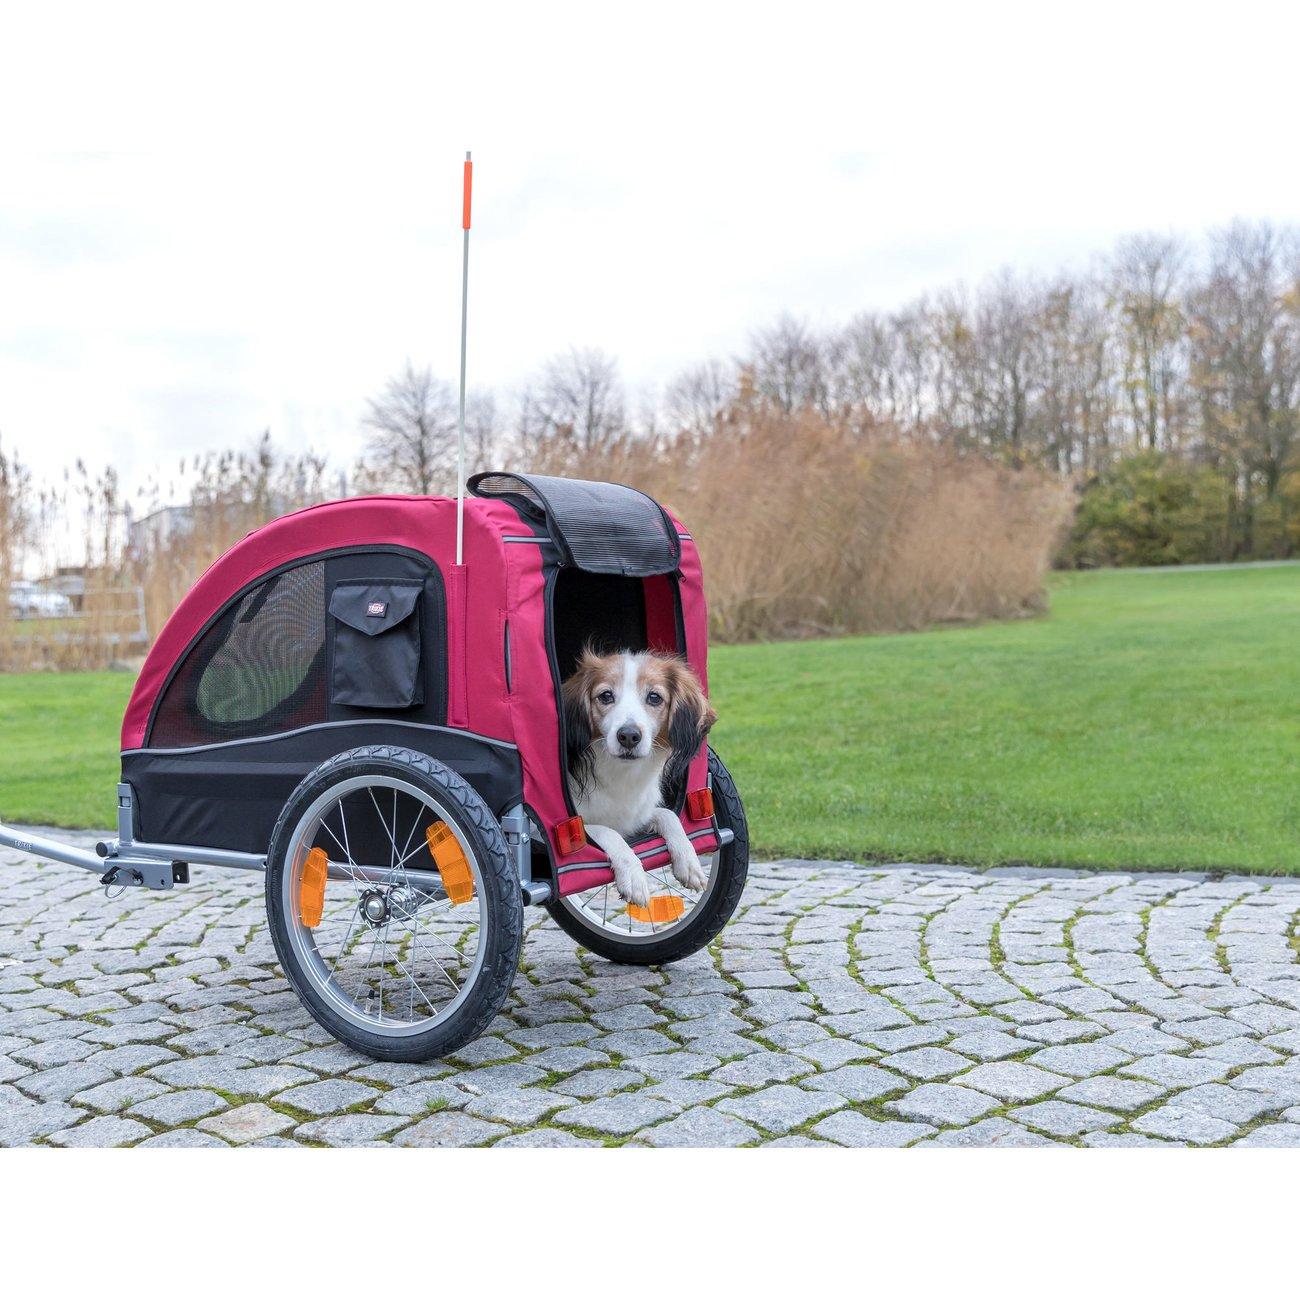 Fahrradanhänger für Hunde Bild 12